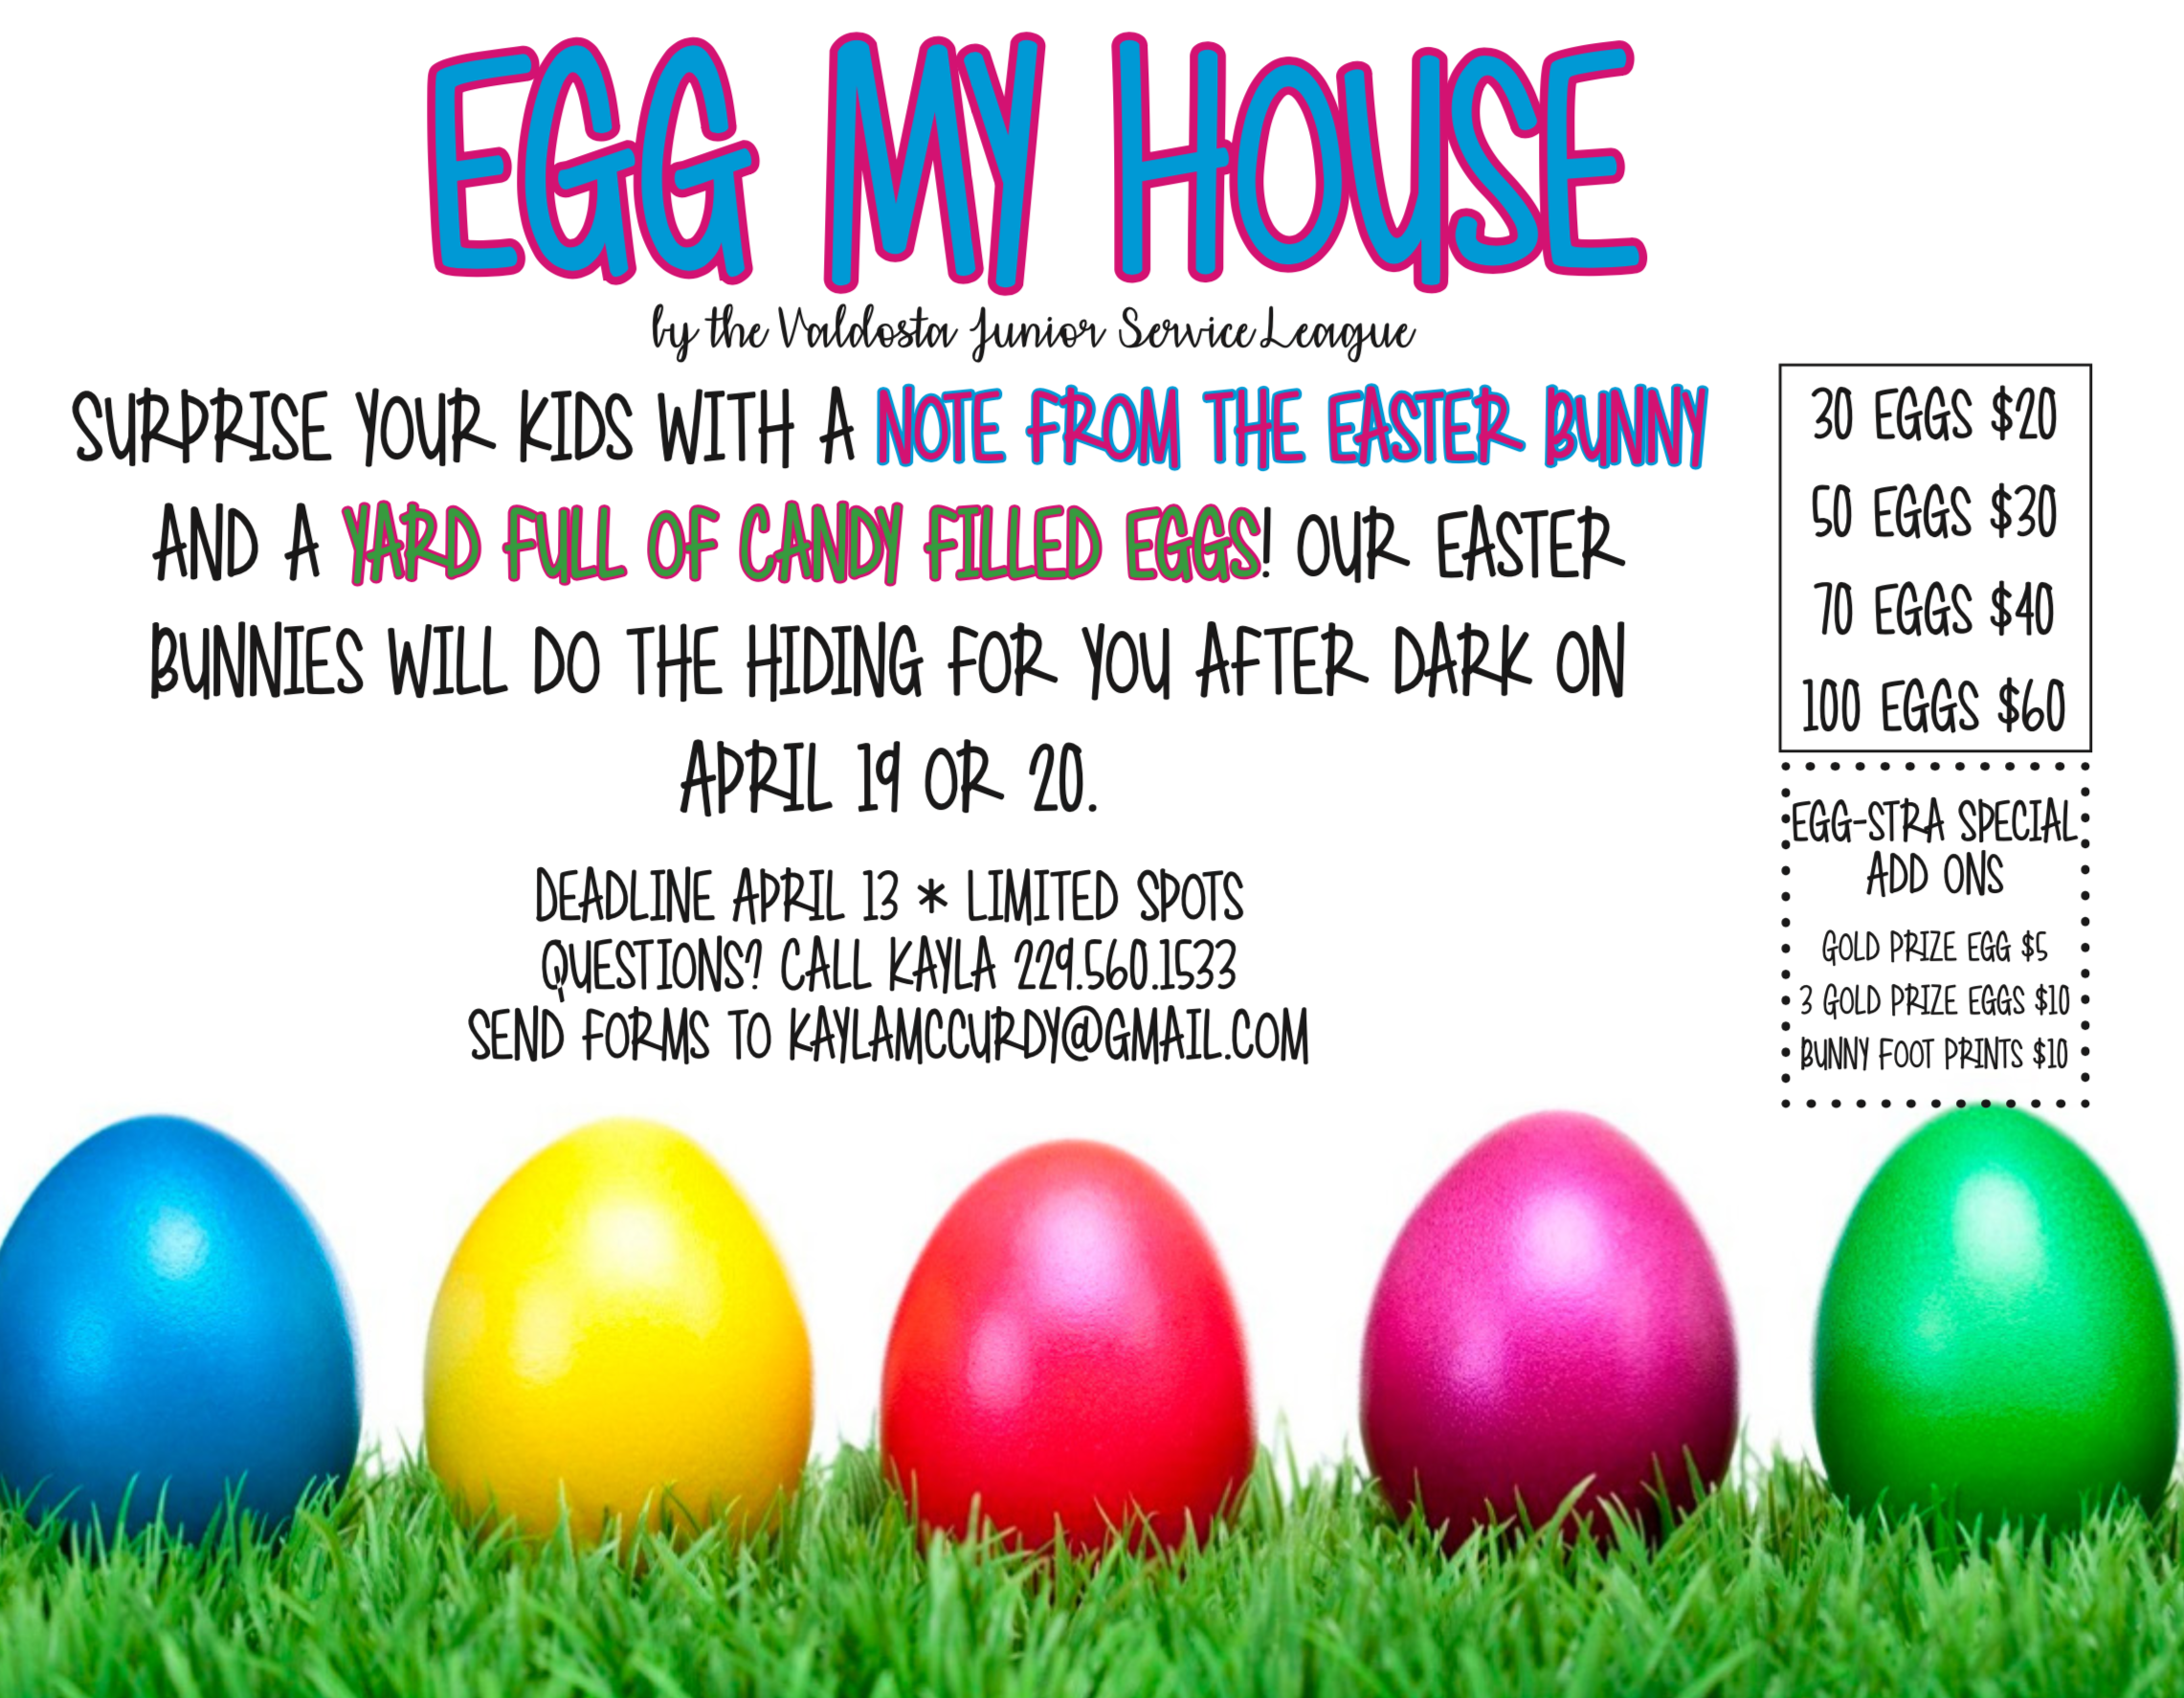 Enjoyable Valdosta Junior Service League Egg My House Easter Egg Fun Download Free Architecture Designs Terstmadebymaigaardcom